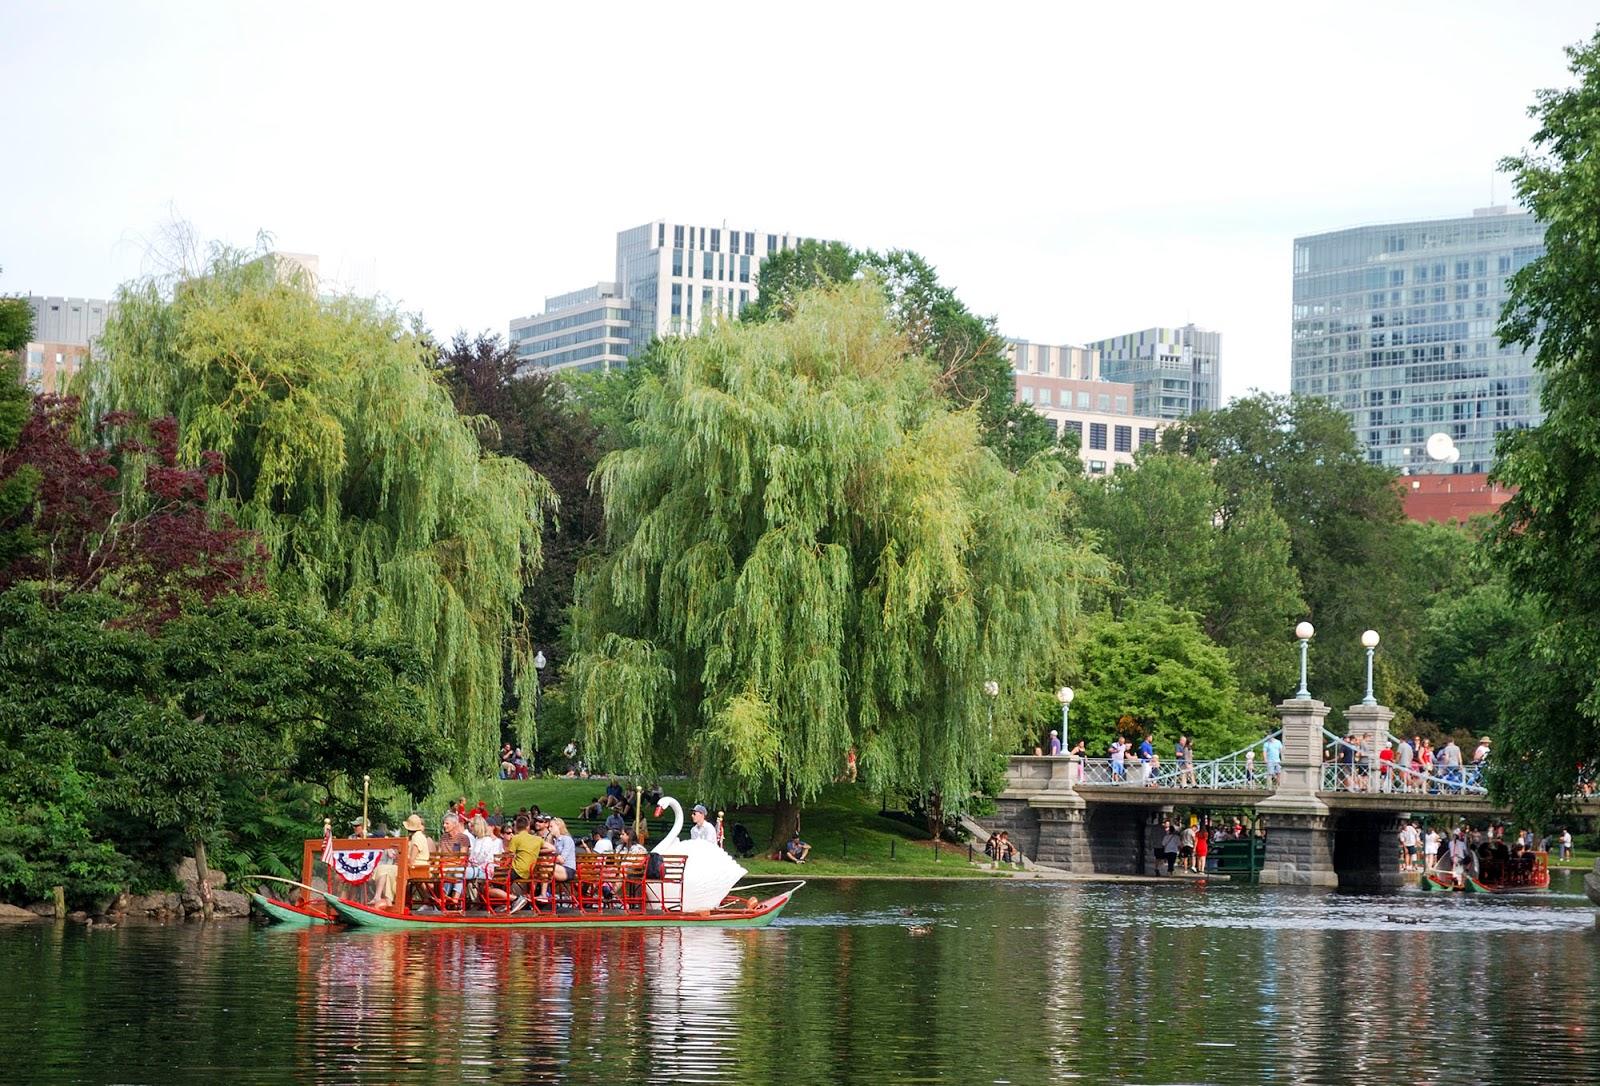 swan boat boston public garden itinerary plan guide tourism usa america park east coast